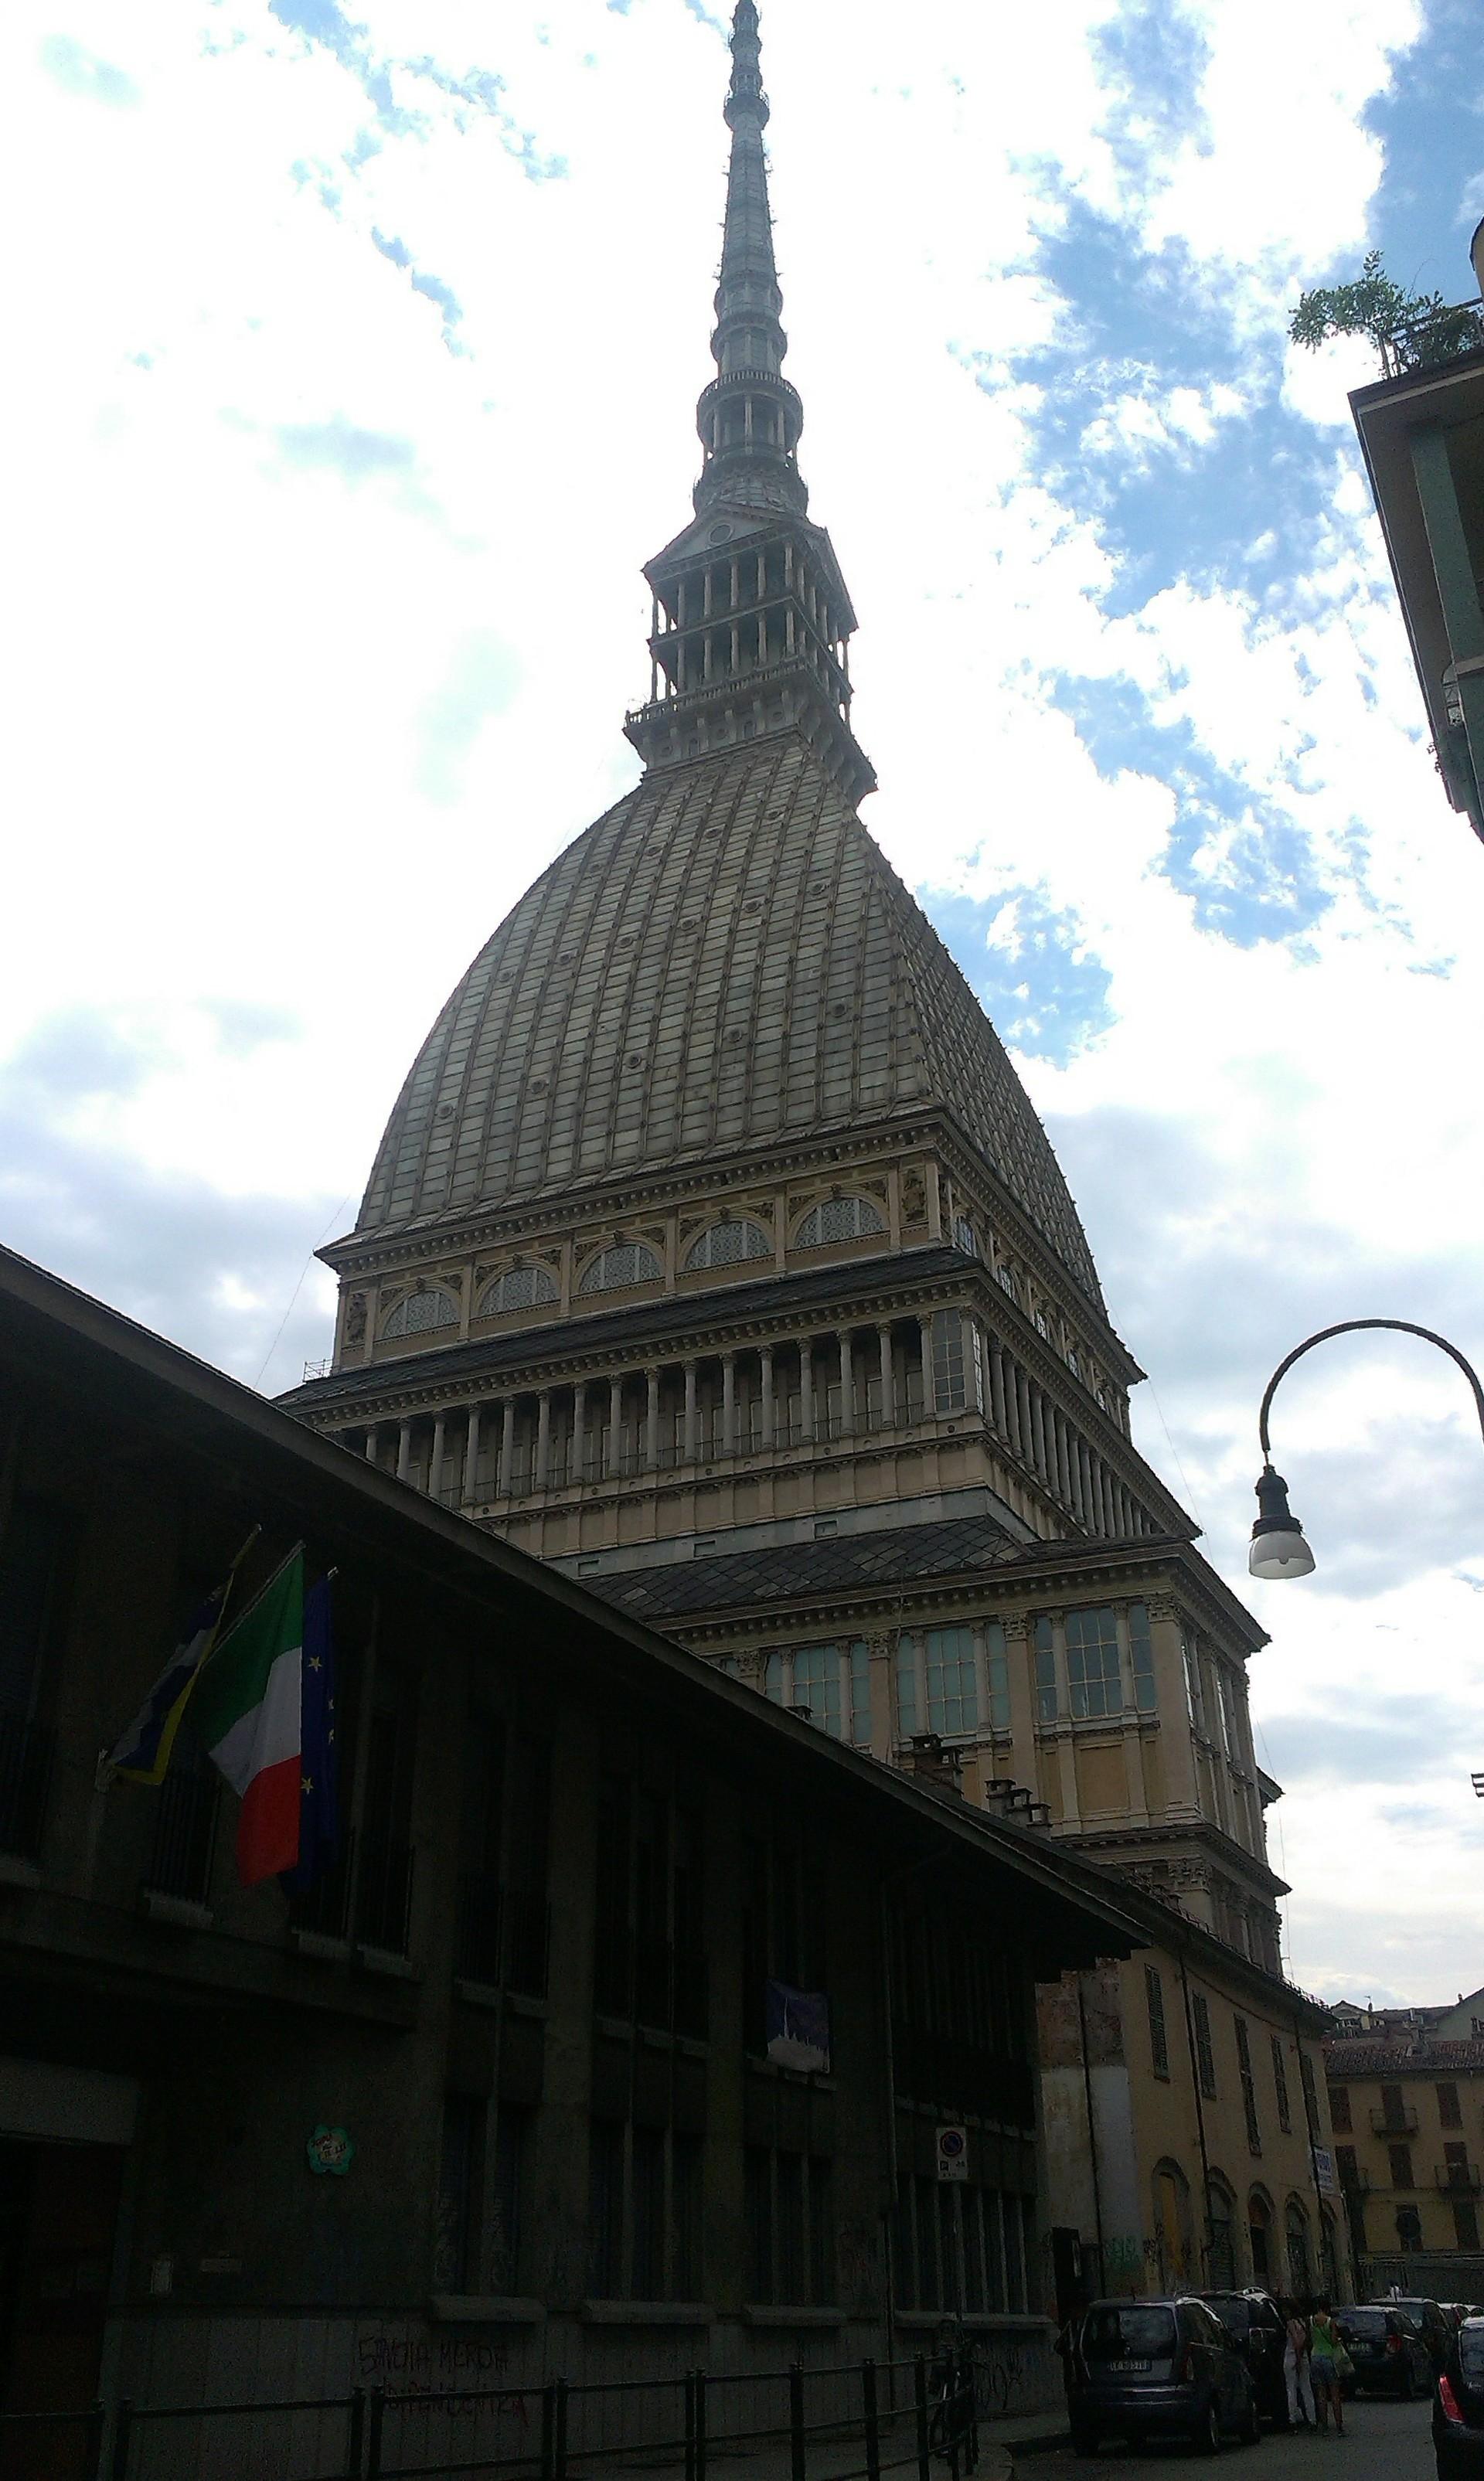 esperienza-torino-italia-edo-809b1952a9b